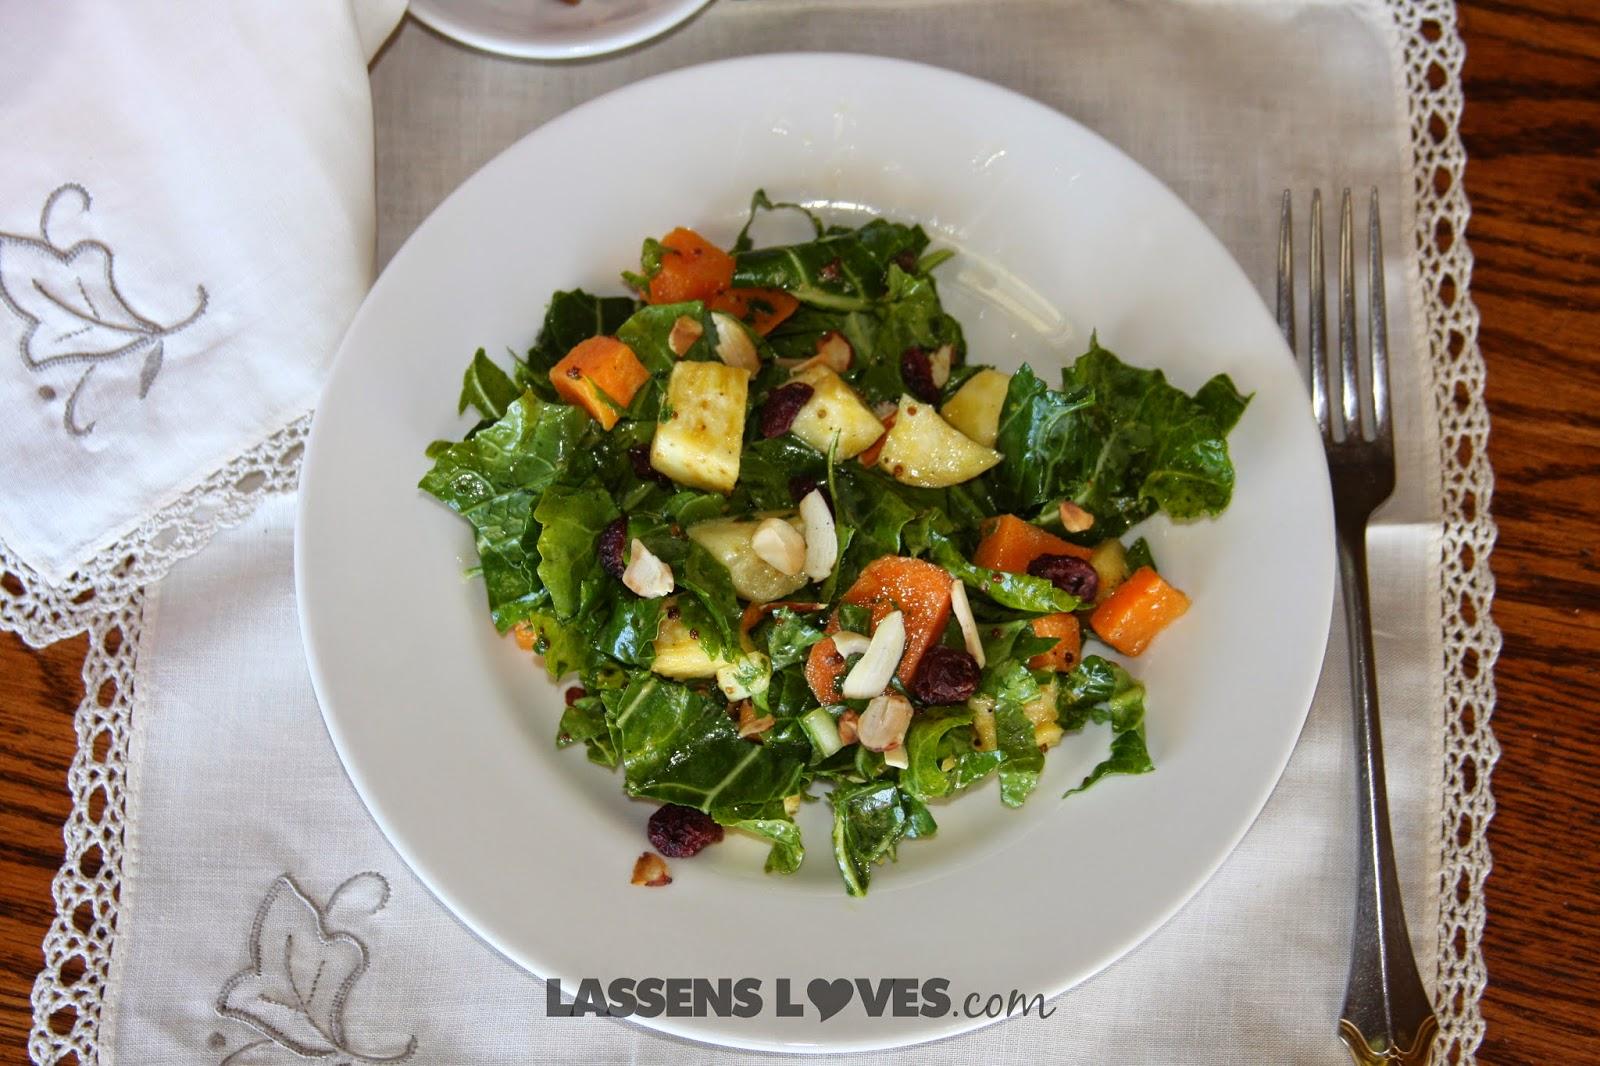 organic+produce, organic+broccoleaf, broccoleaf+recipes, how+to+cook+broccoleaf